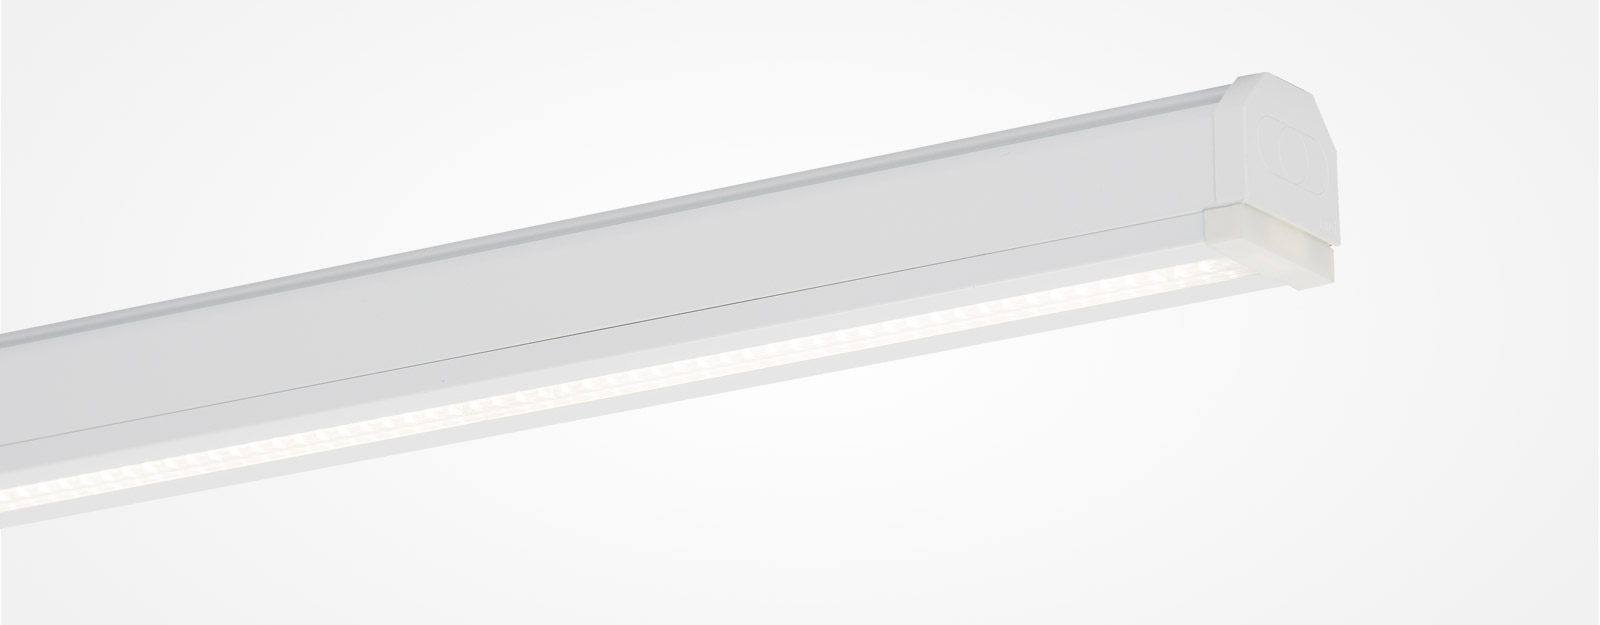 Ridi Leuchten Geräteträger VLG 258 5 EVG